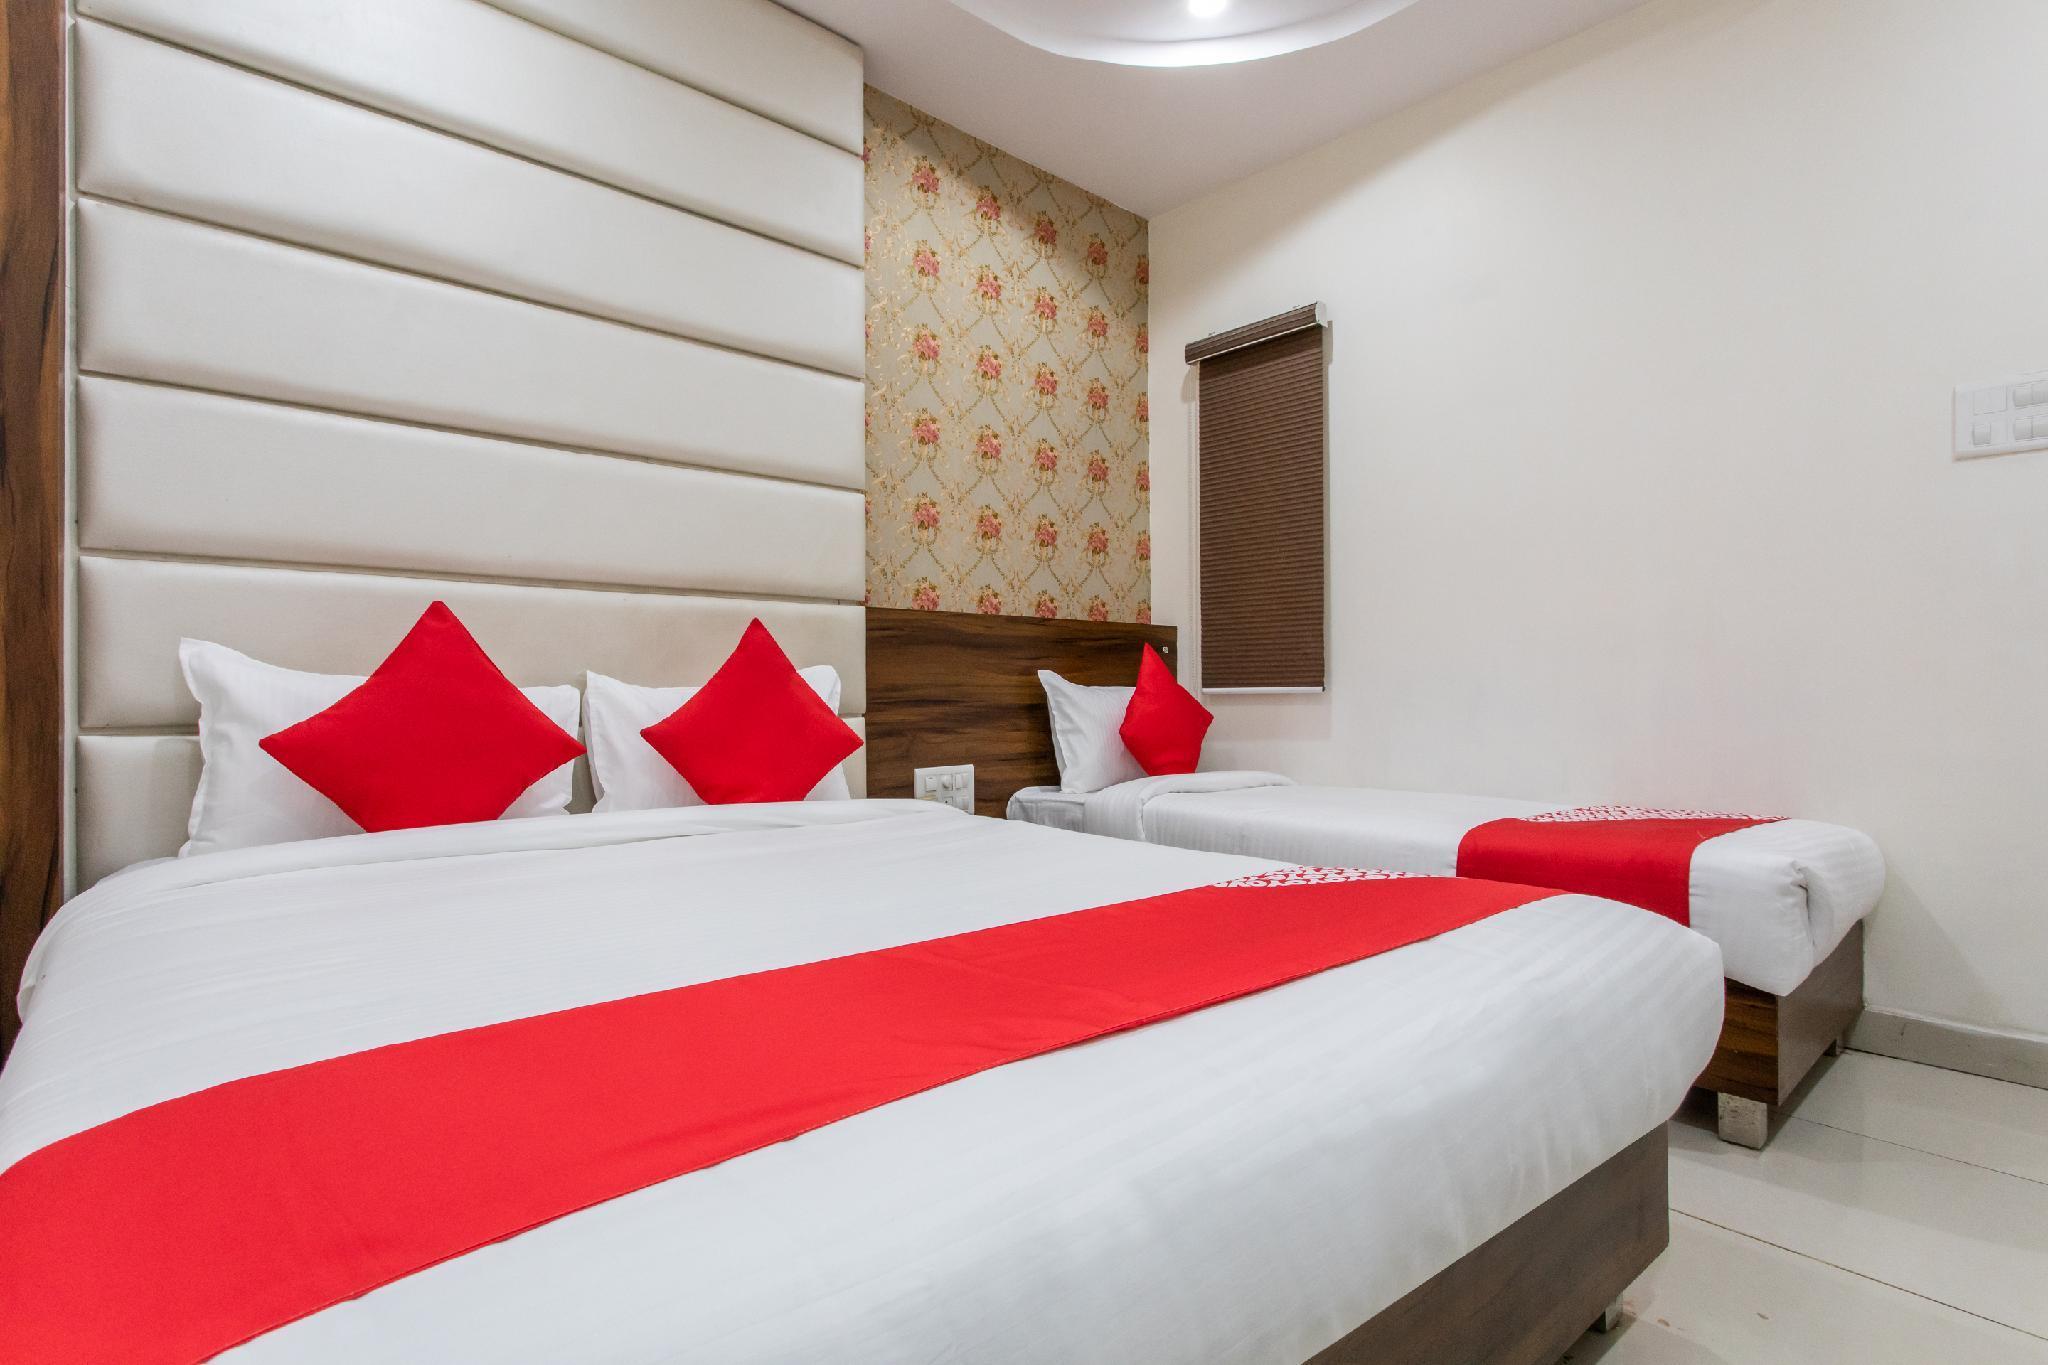 OYO 24144 Tathastu Hotel